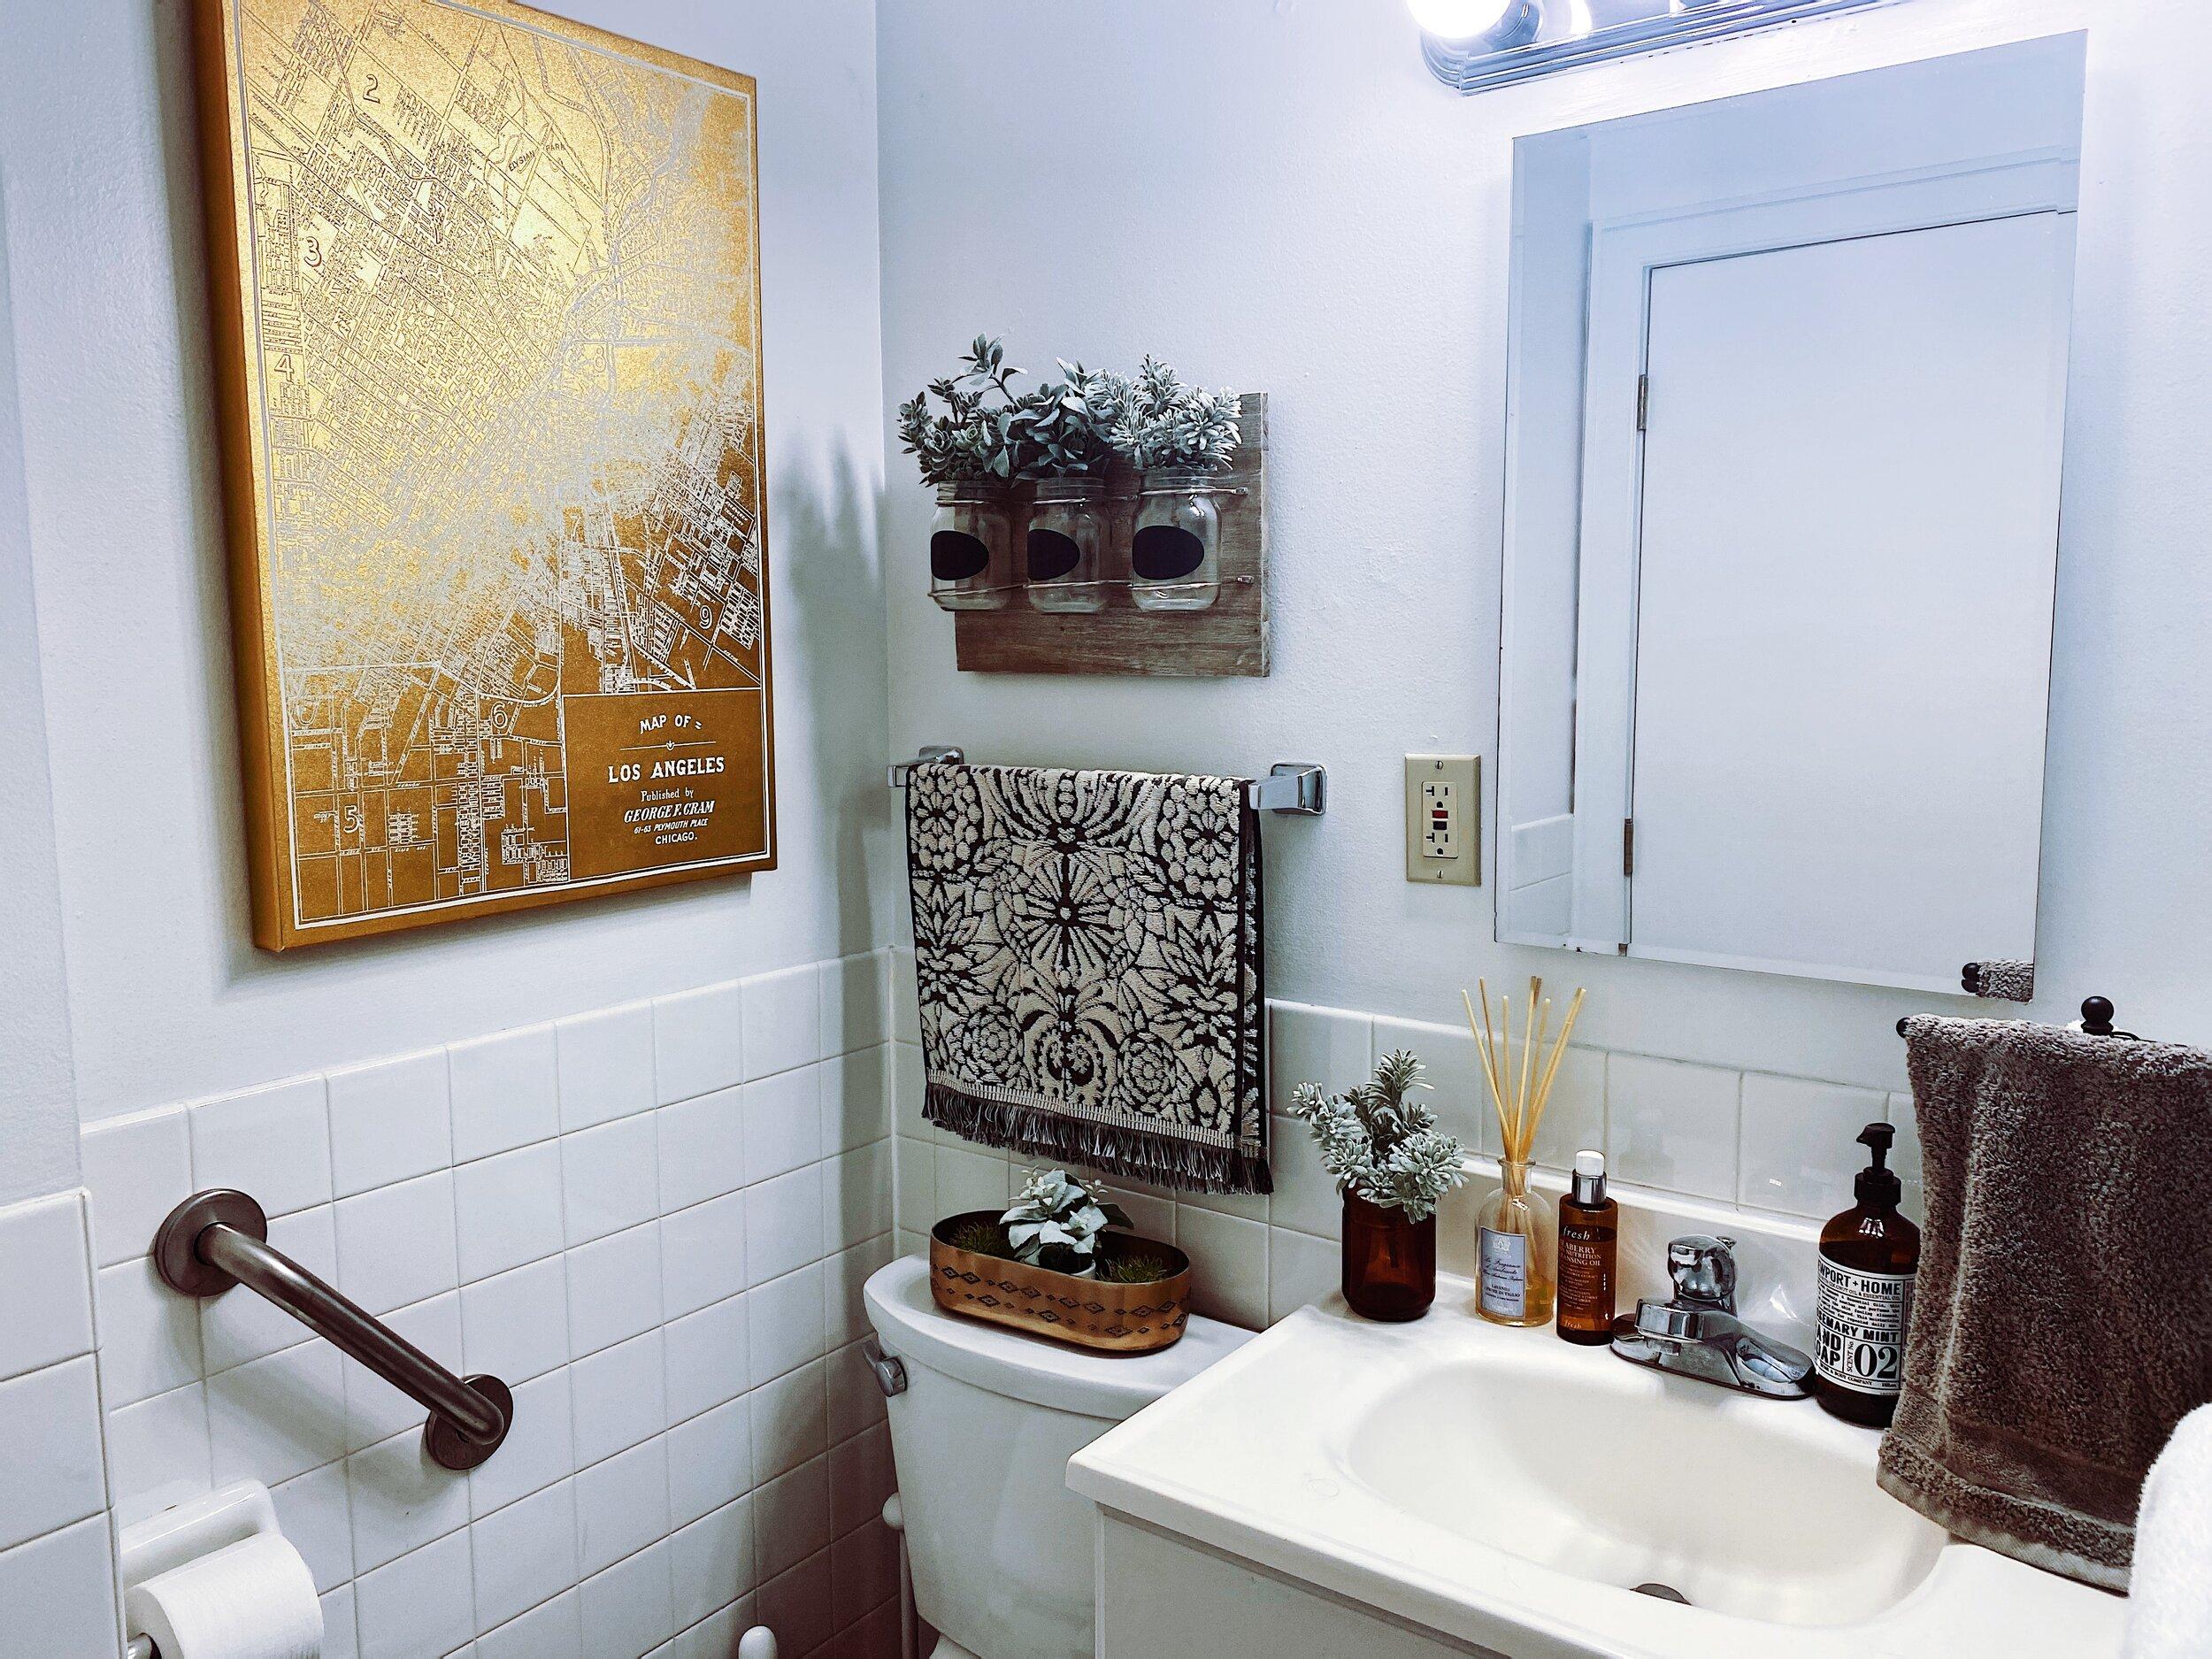 Small Apartment Bathroom Ideas How To, Small Bathroom Decorating